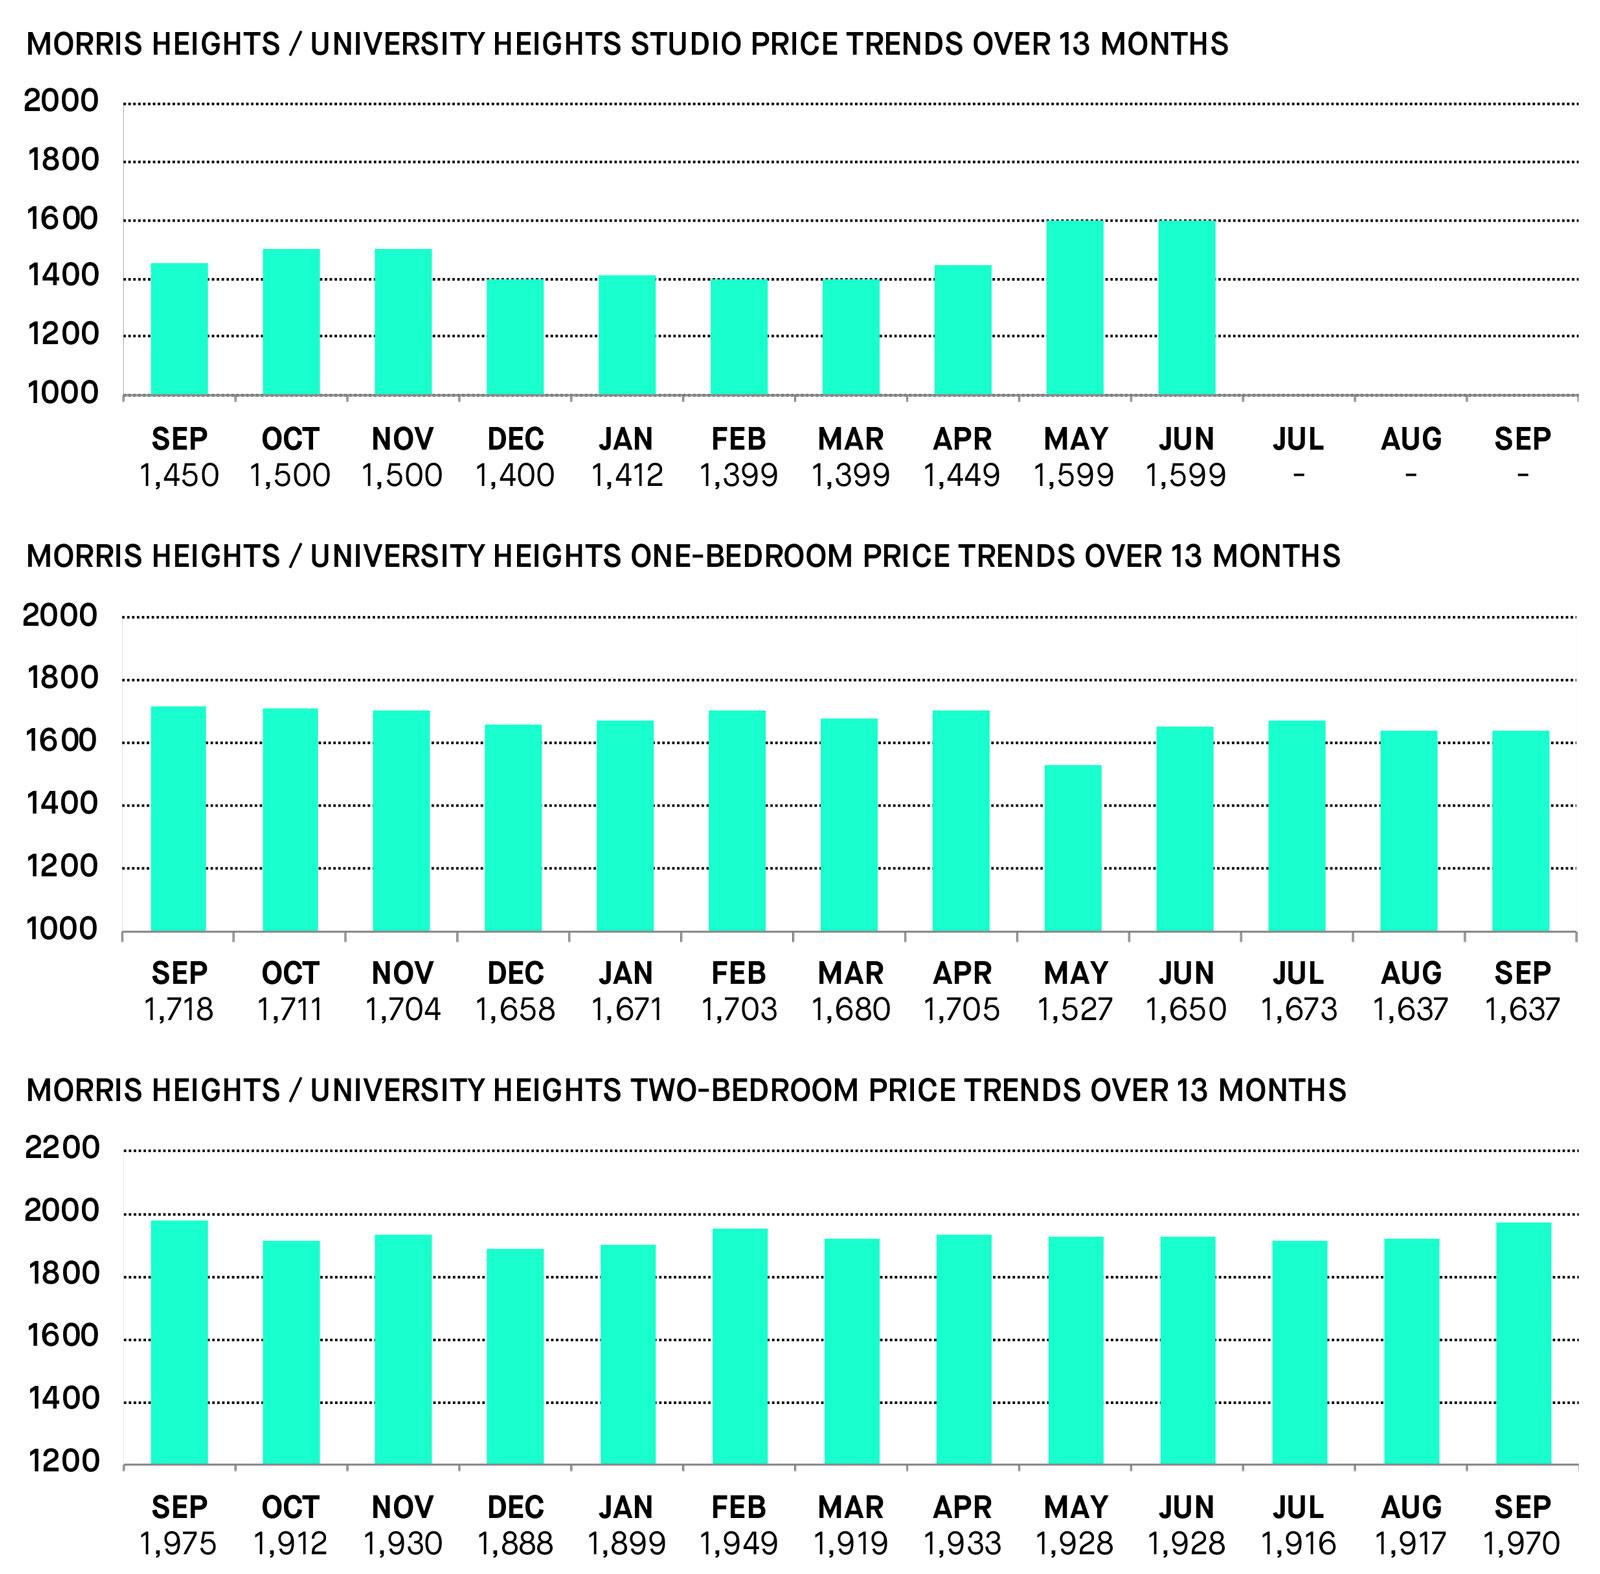 MORRIS HEIGHTS/UNIVERSITY HEIGHTS